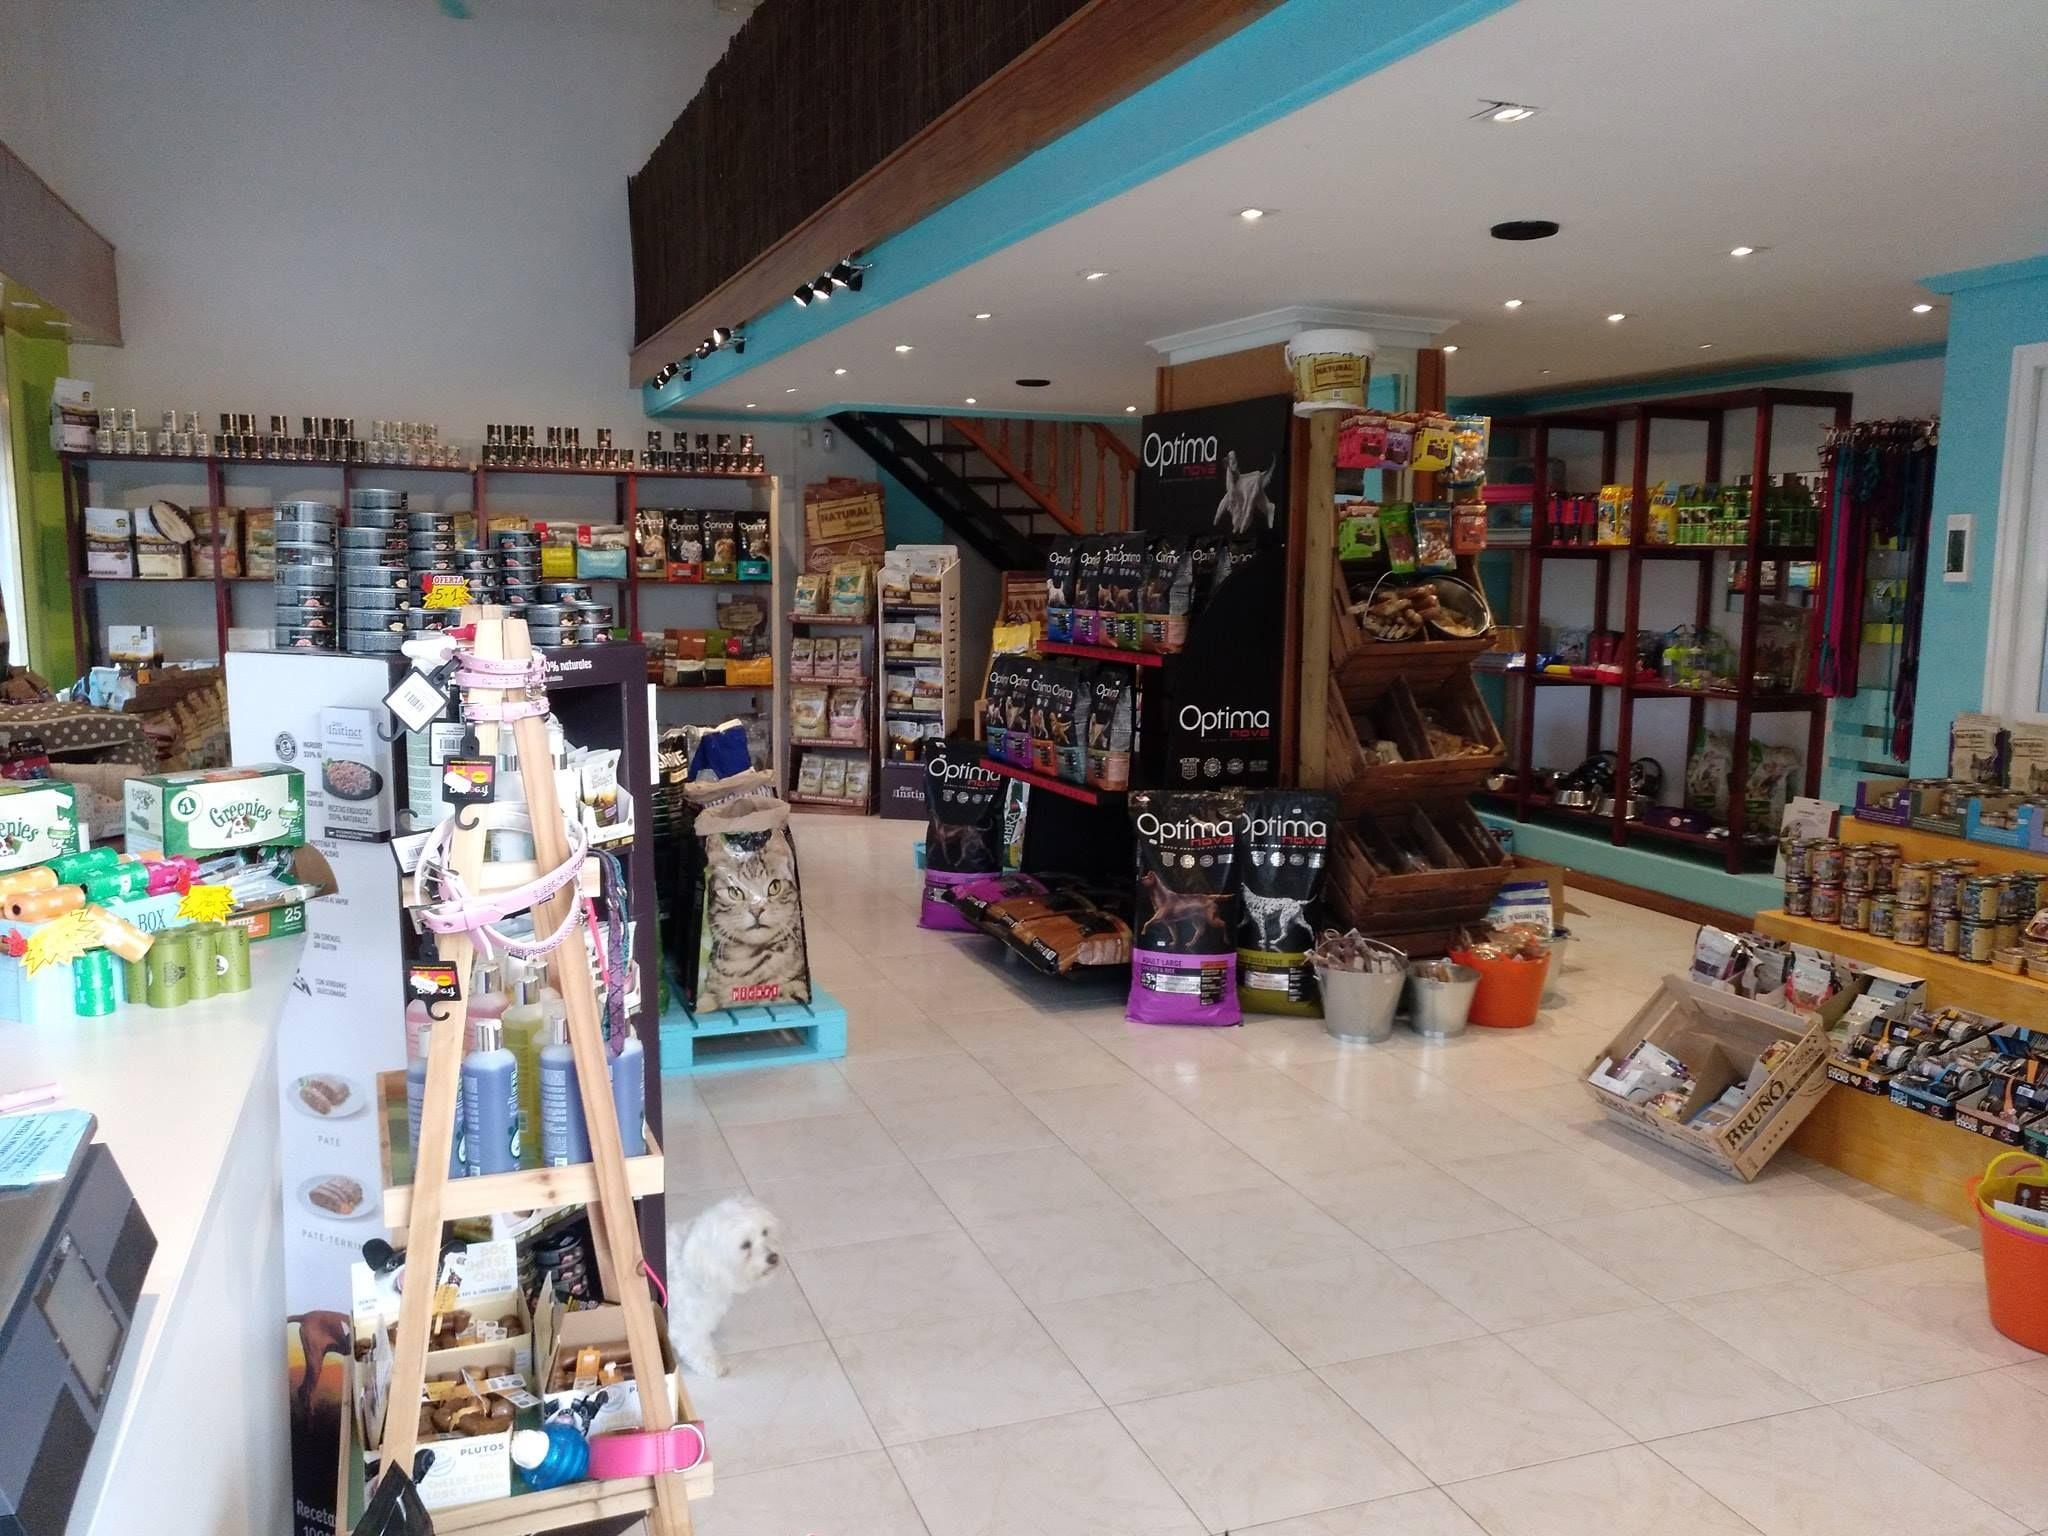 Tienda de mascotas cerca de San Antonio, Ibiza